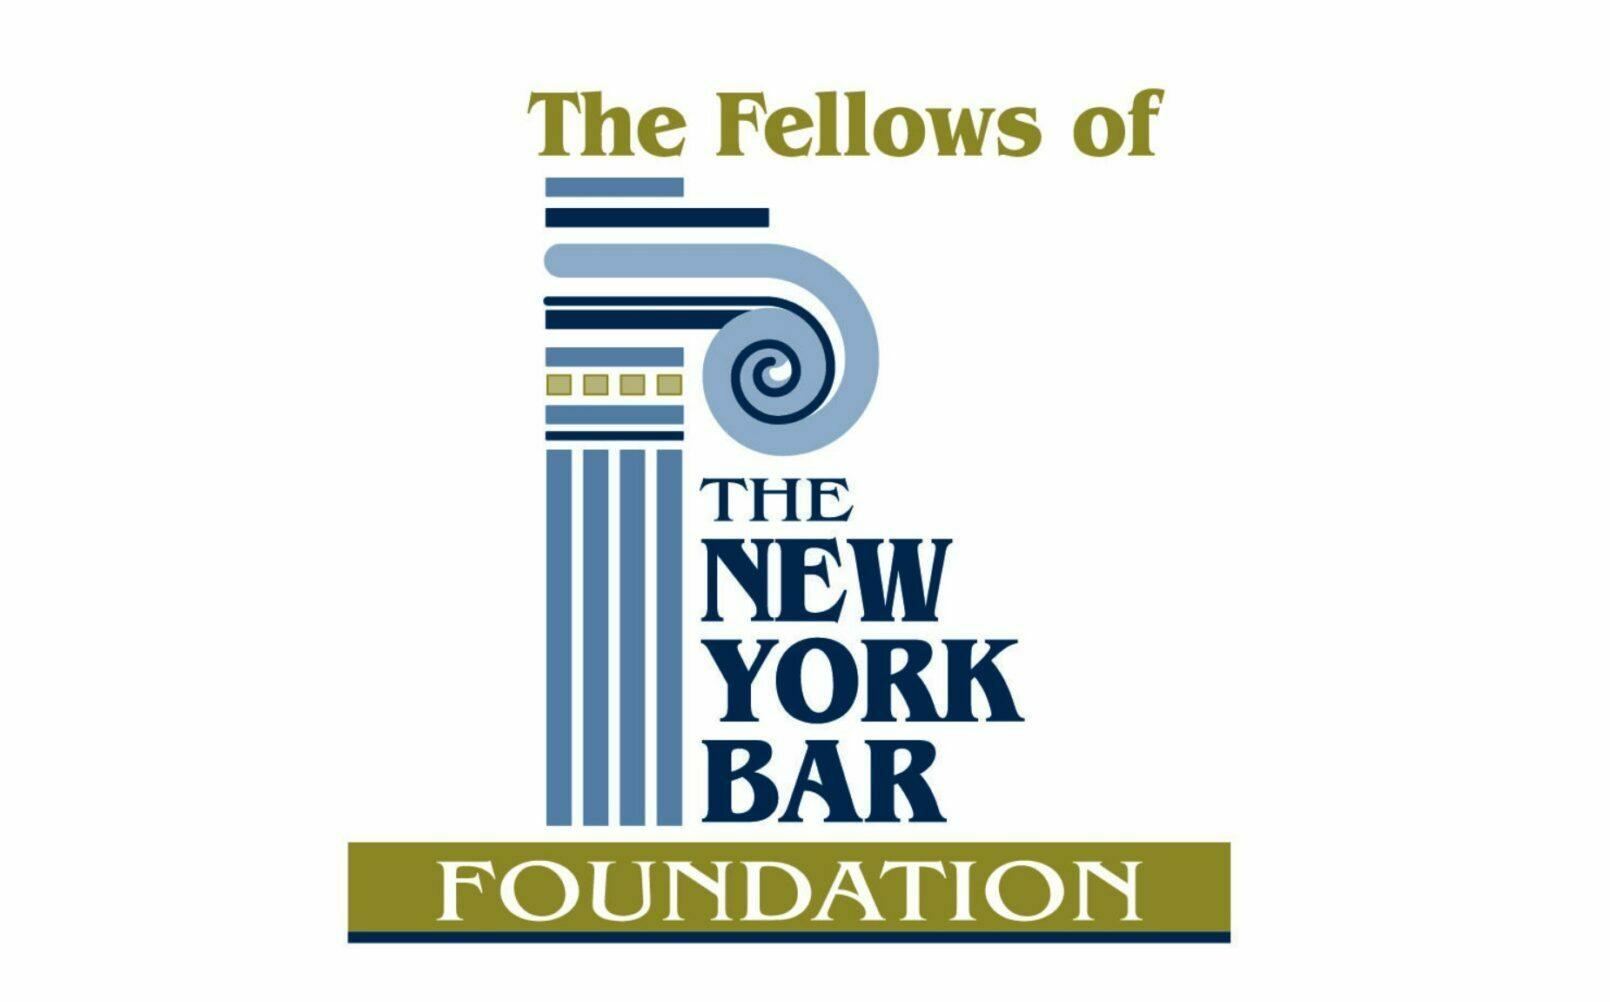 The fellows of the new york bar foundation